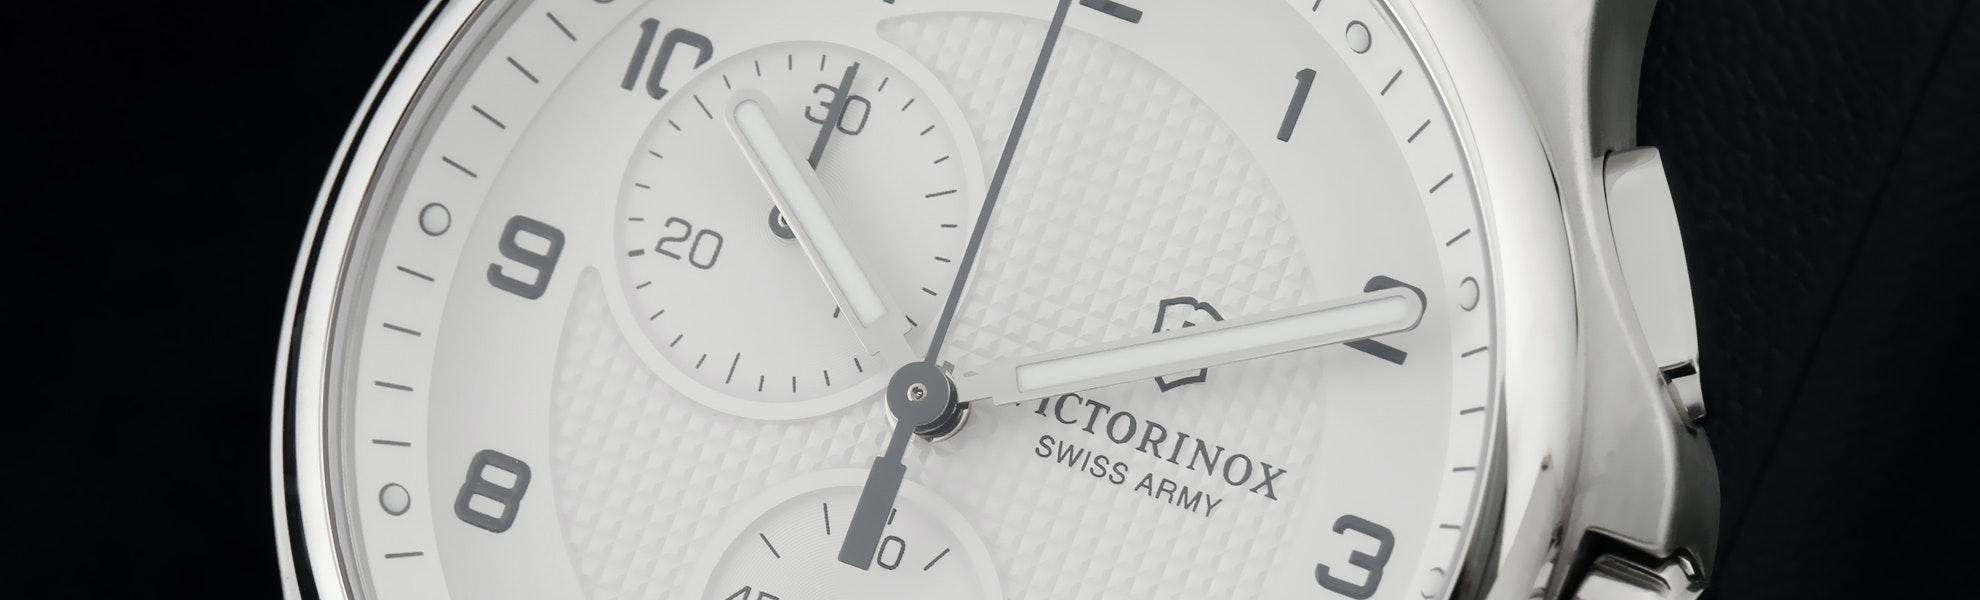 Victorinox Officer's Chronograph Watch